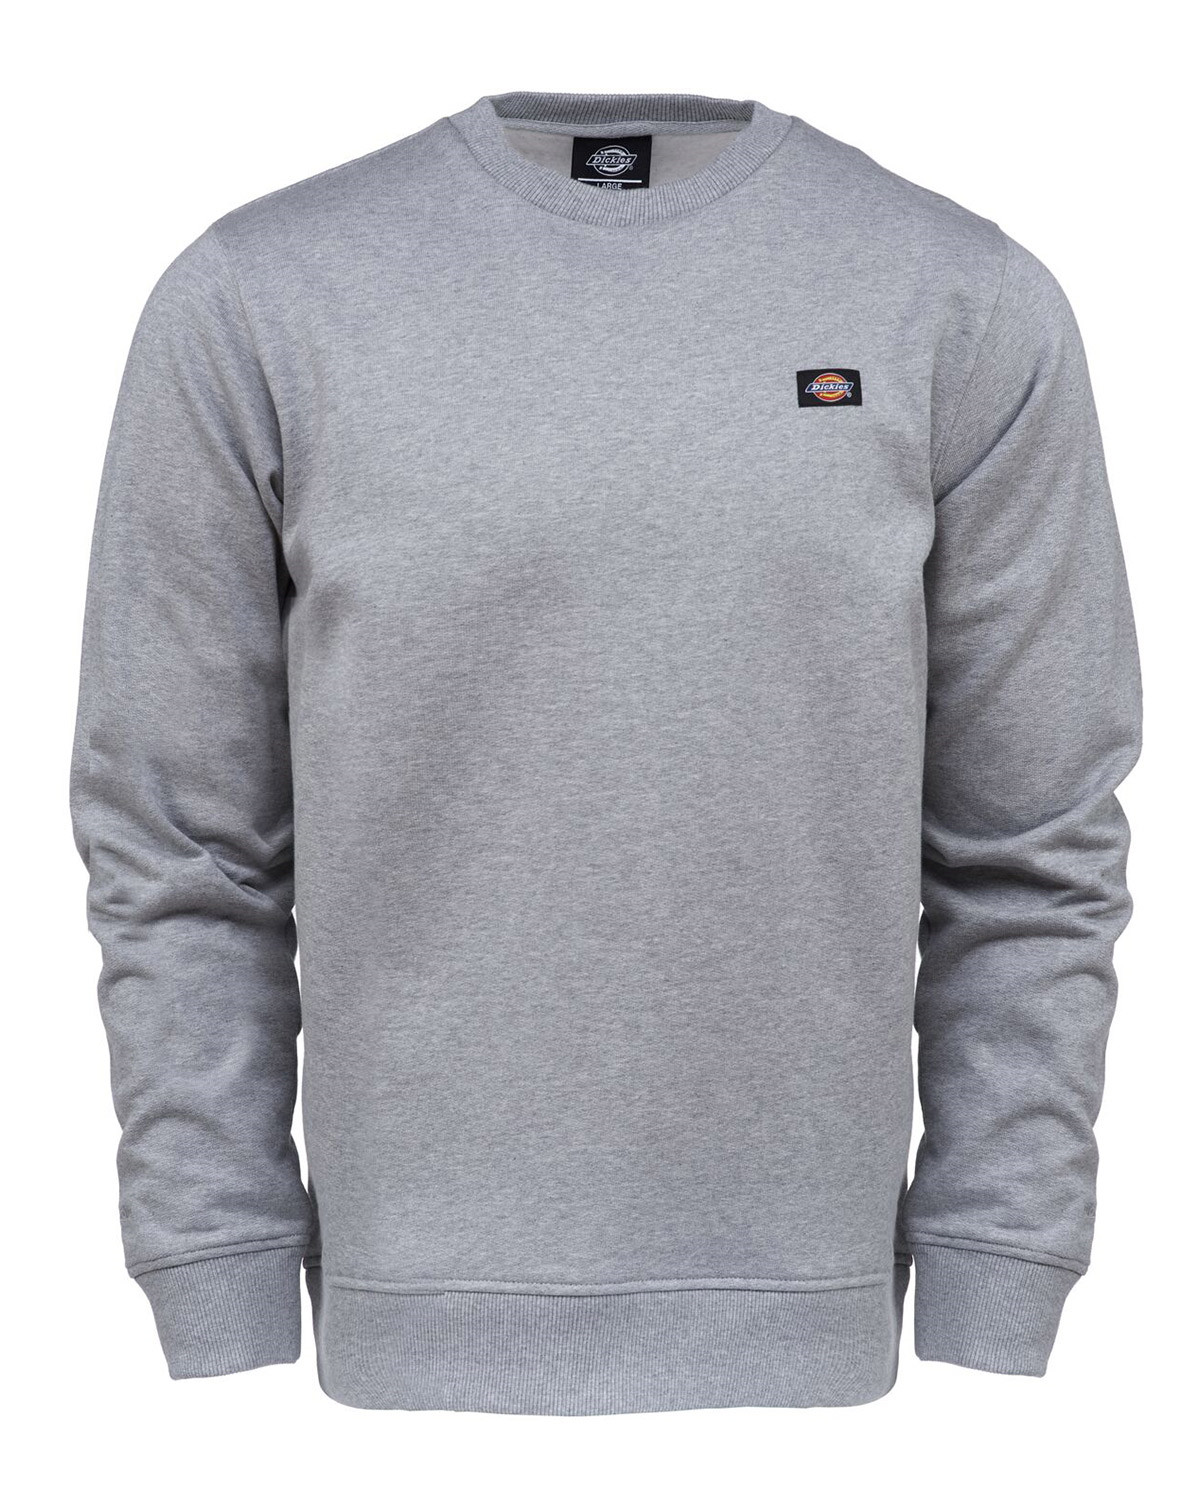 Image of   DICKIES New Jersey Sweatshirt (Grå Meleret, 2XL)